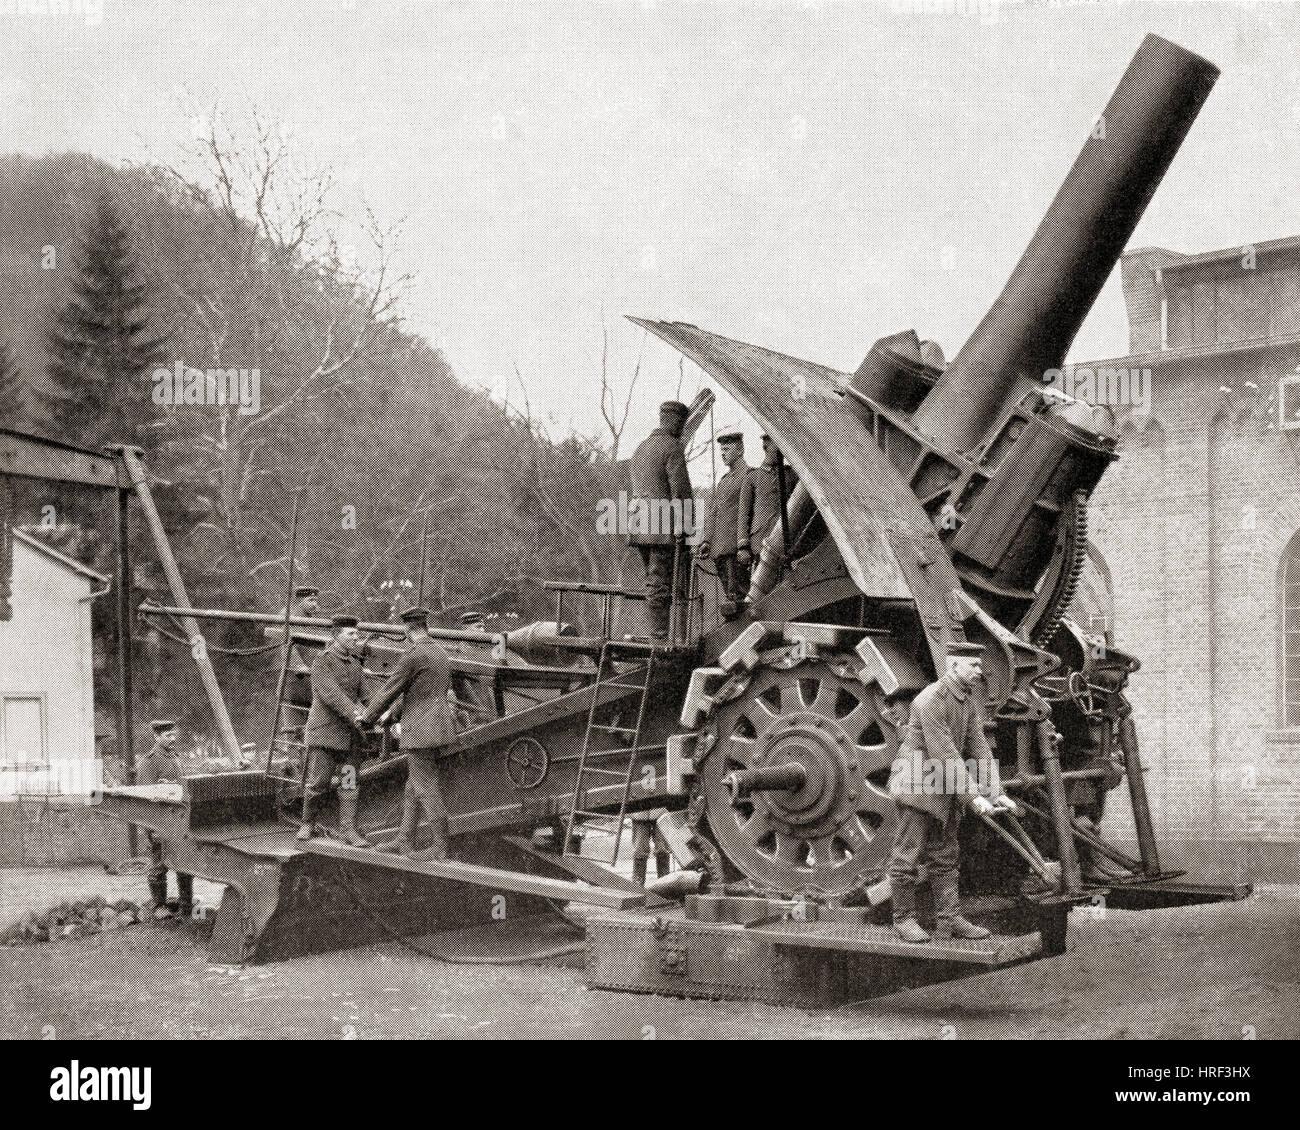 a-big-bertha-a-heavy-howitzer-gun-developed-in-germany-at-the-start-HRF3HX.jpg